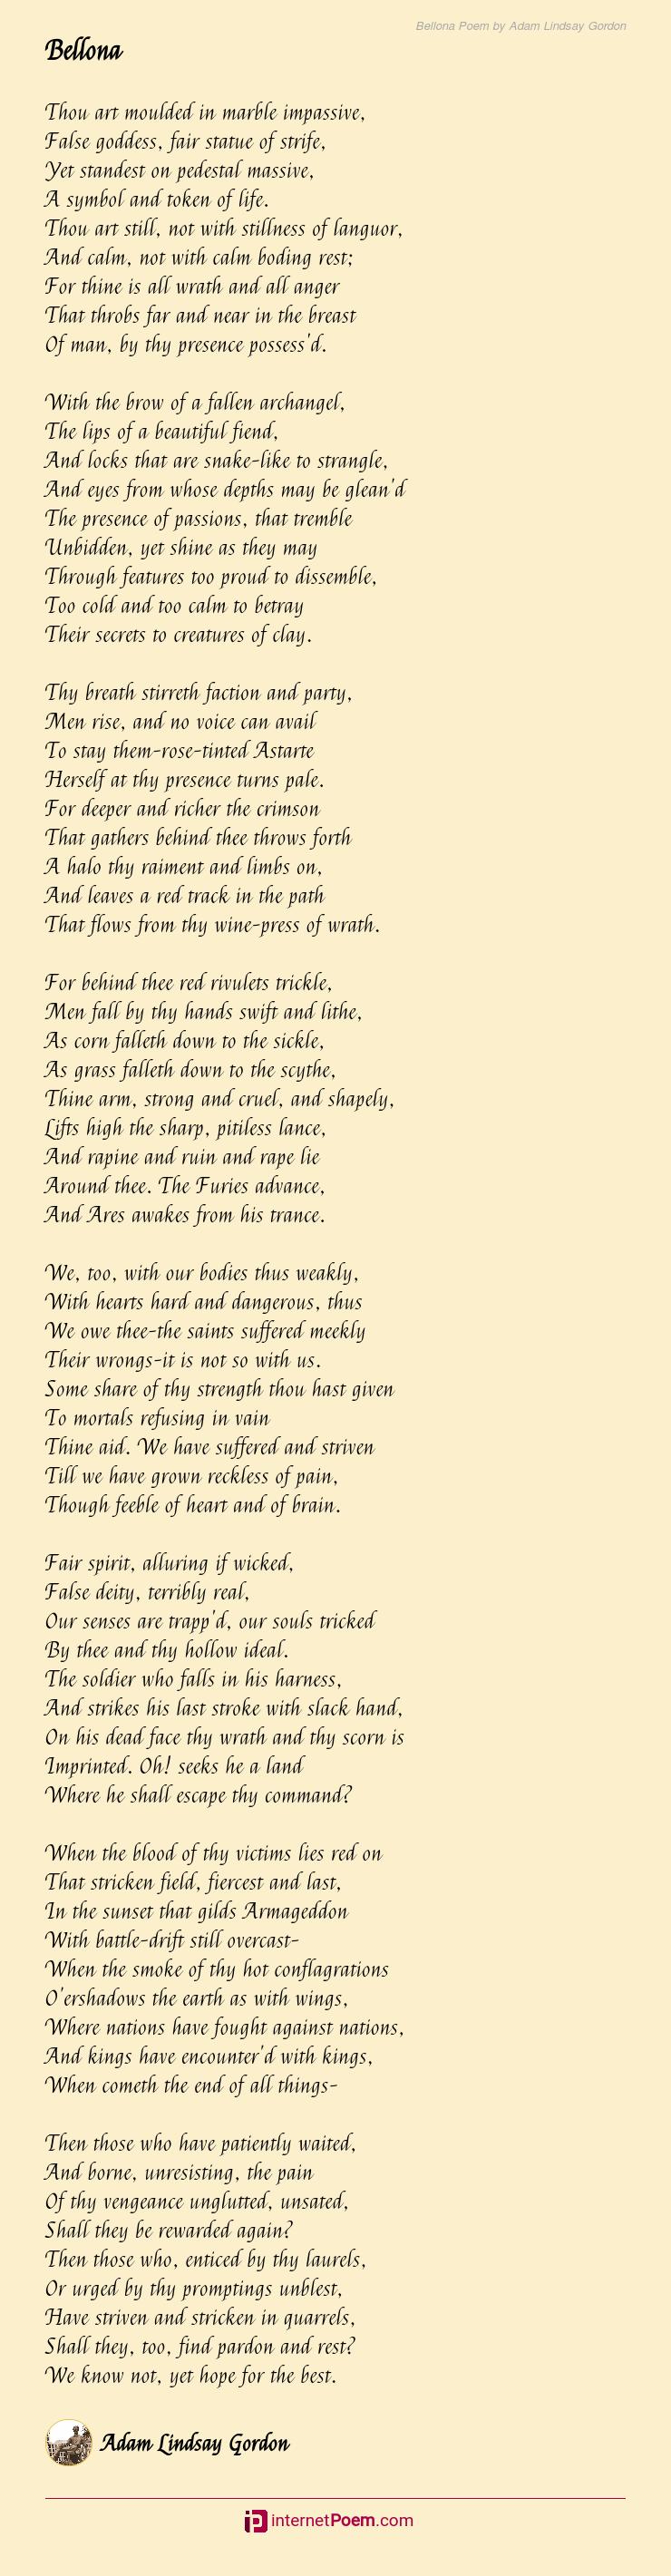 Bellona Poem By Adam Lindsay Gordon